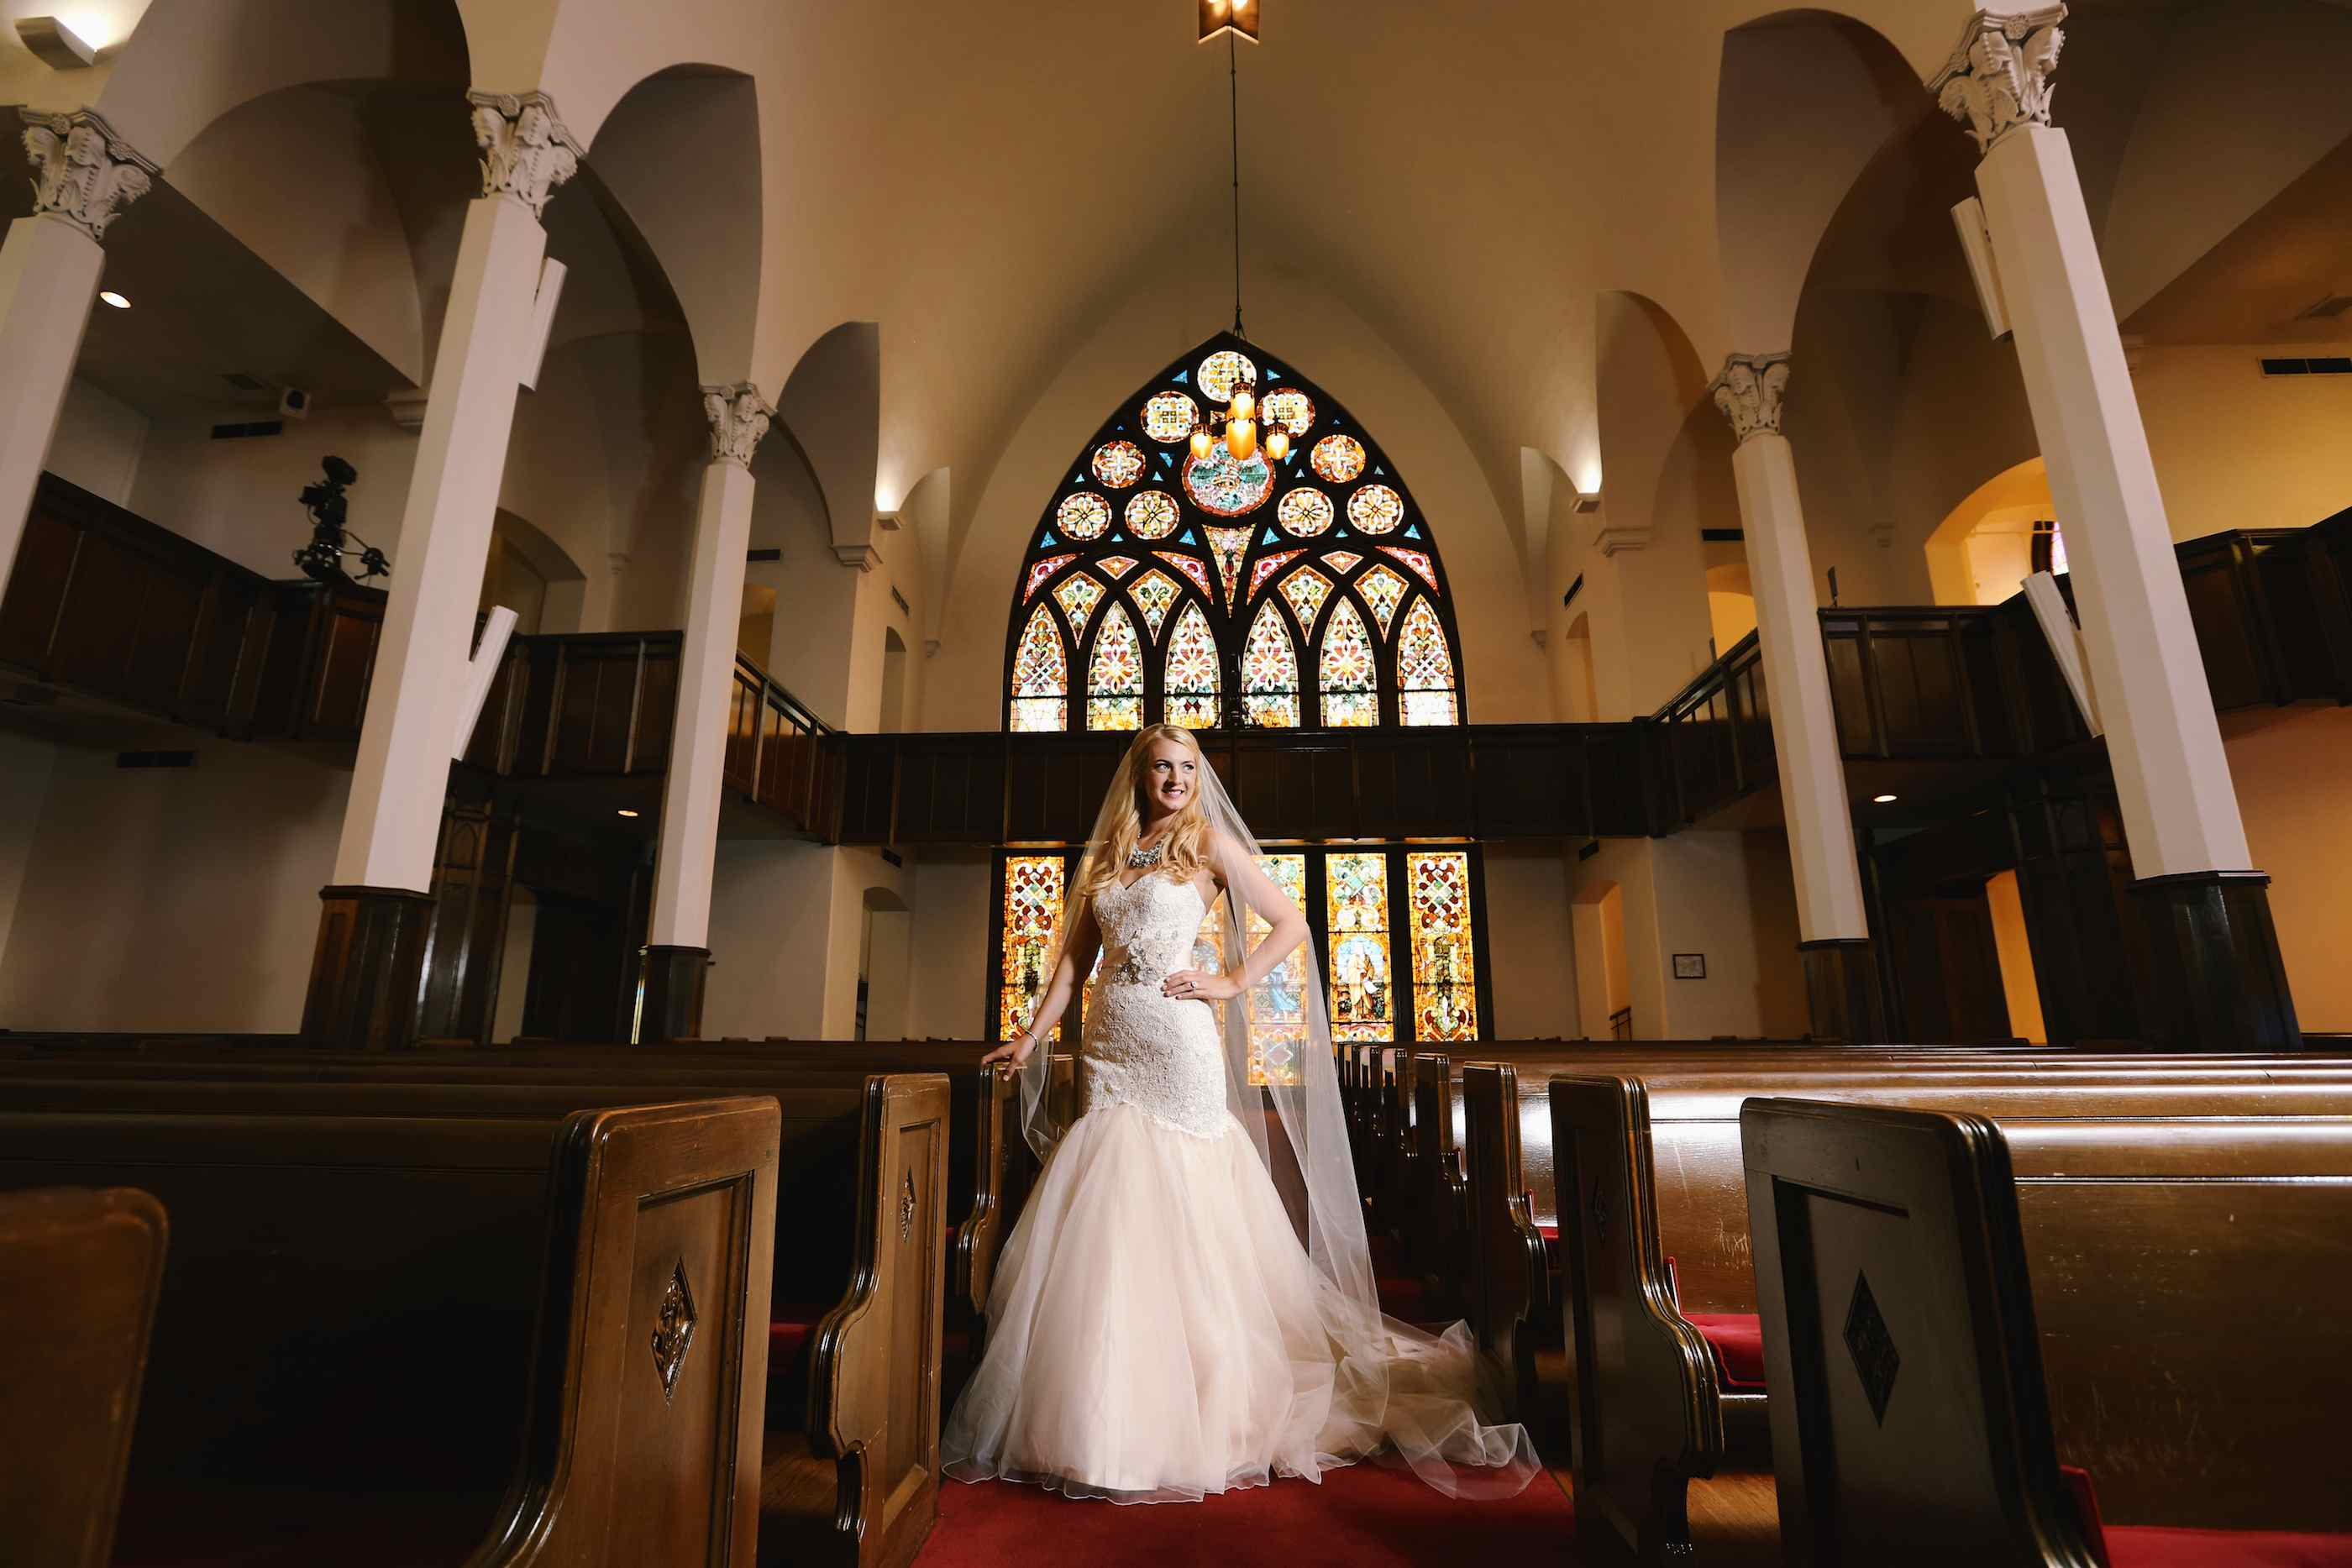 03-top-10-bride-photos-2013-007